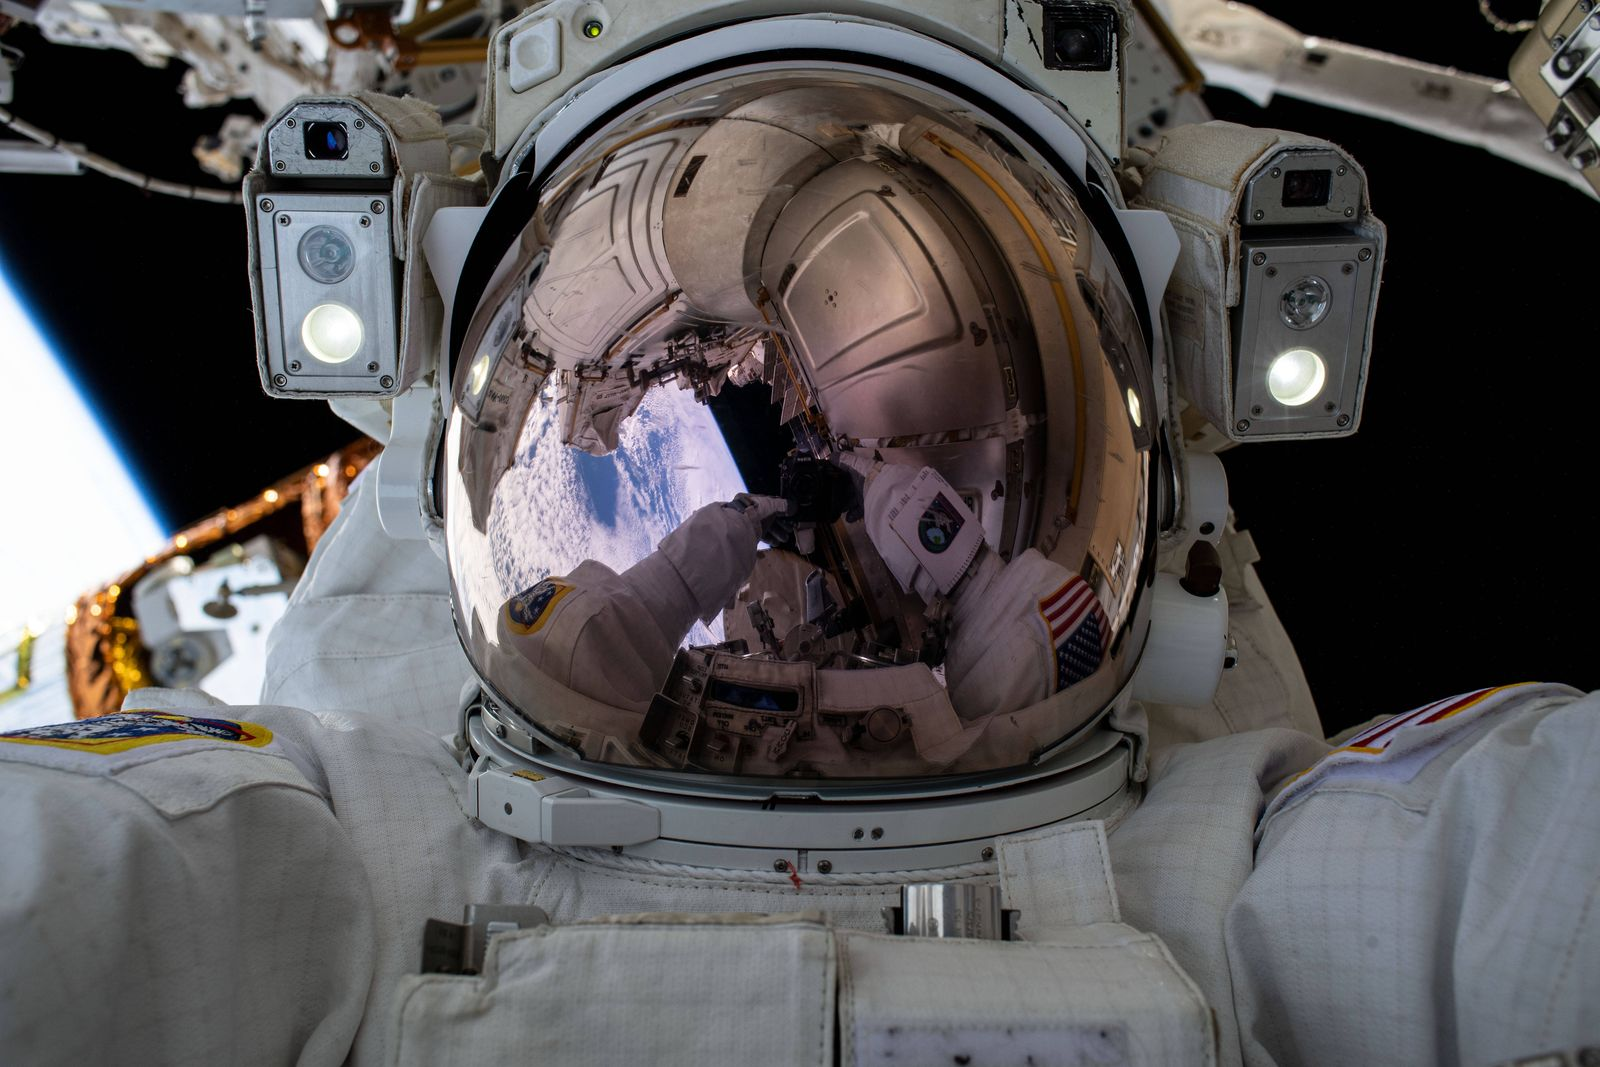 International Space Station Astronaut Chris Cassidy Spacewalk July 21, 2020, International Space Station, EARTH ORBIT: N